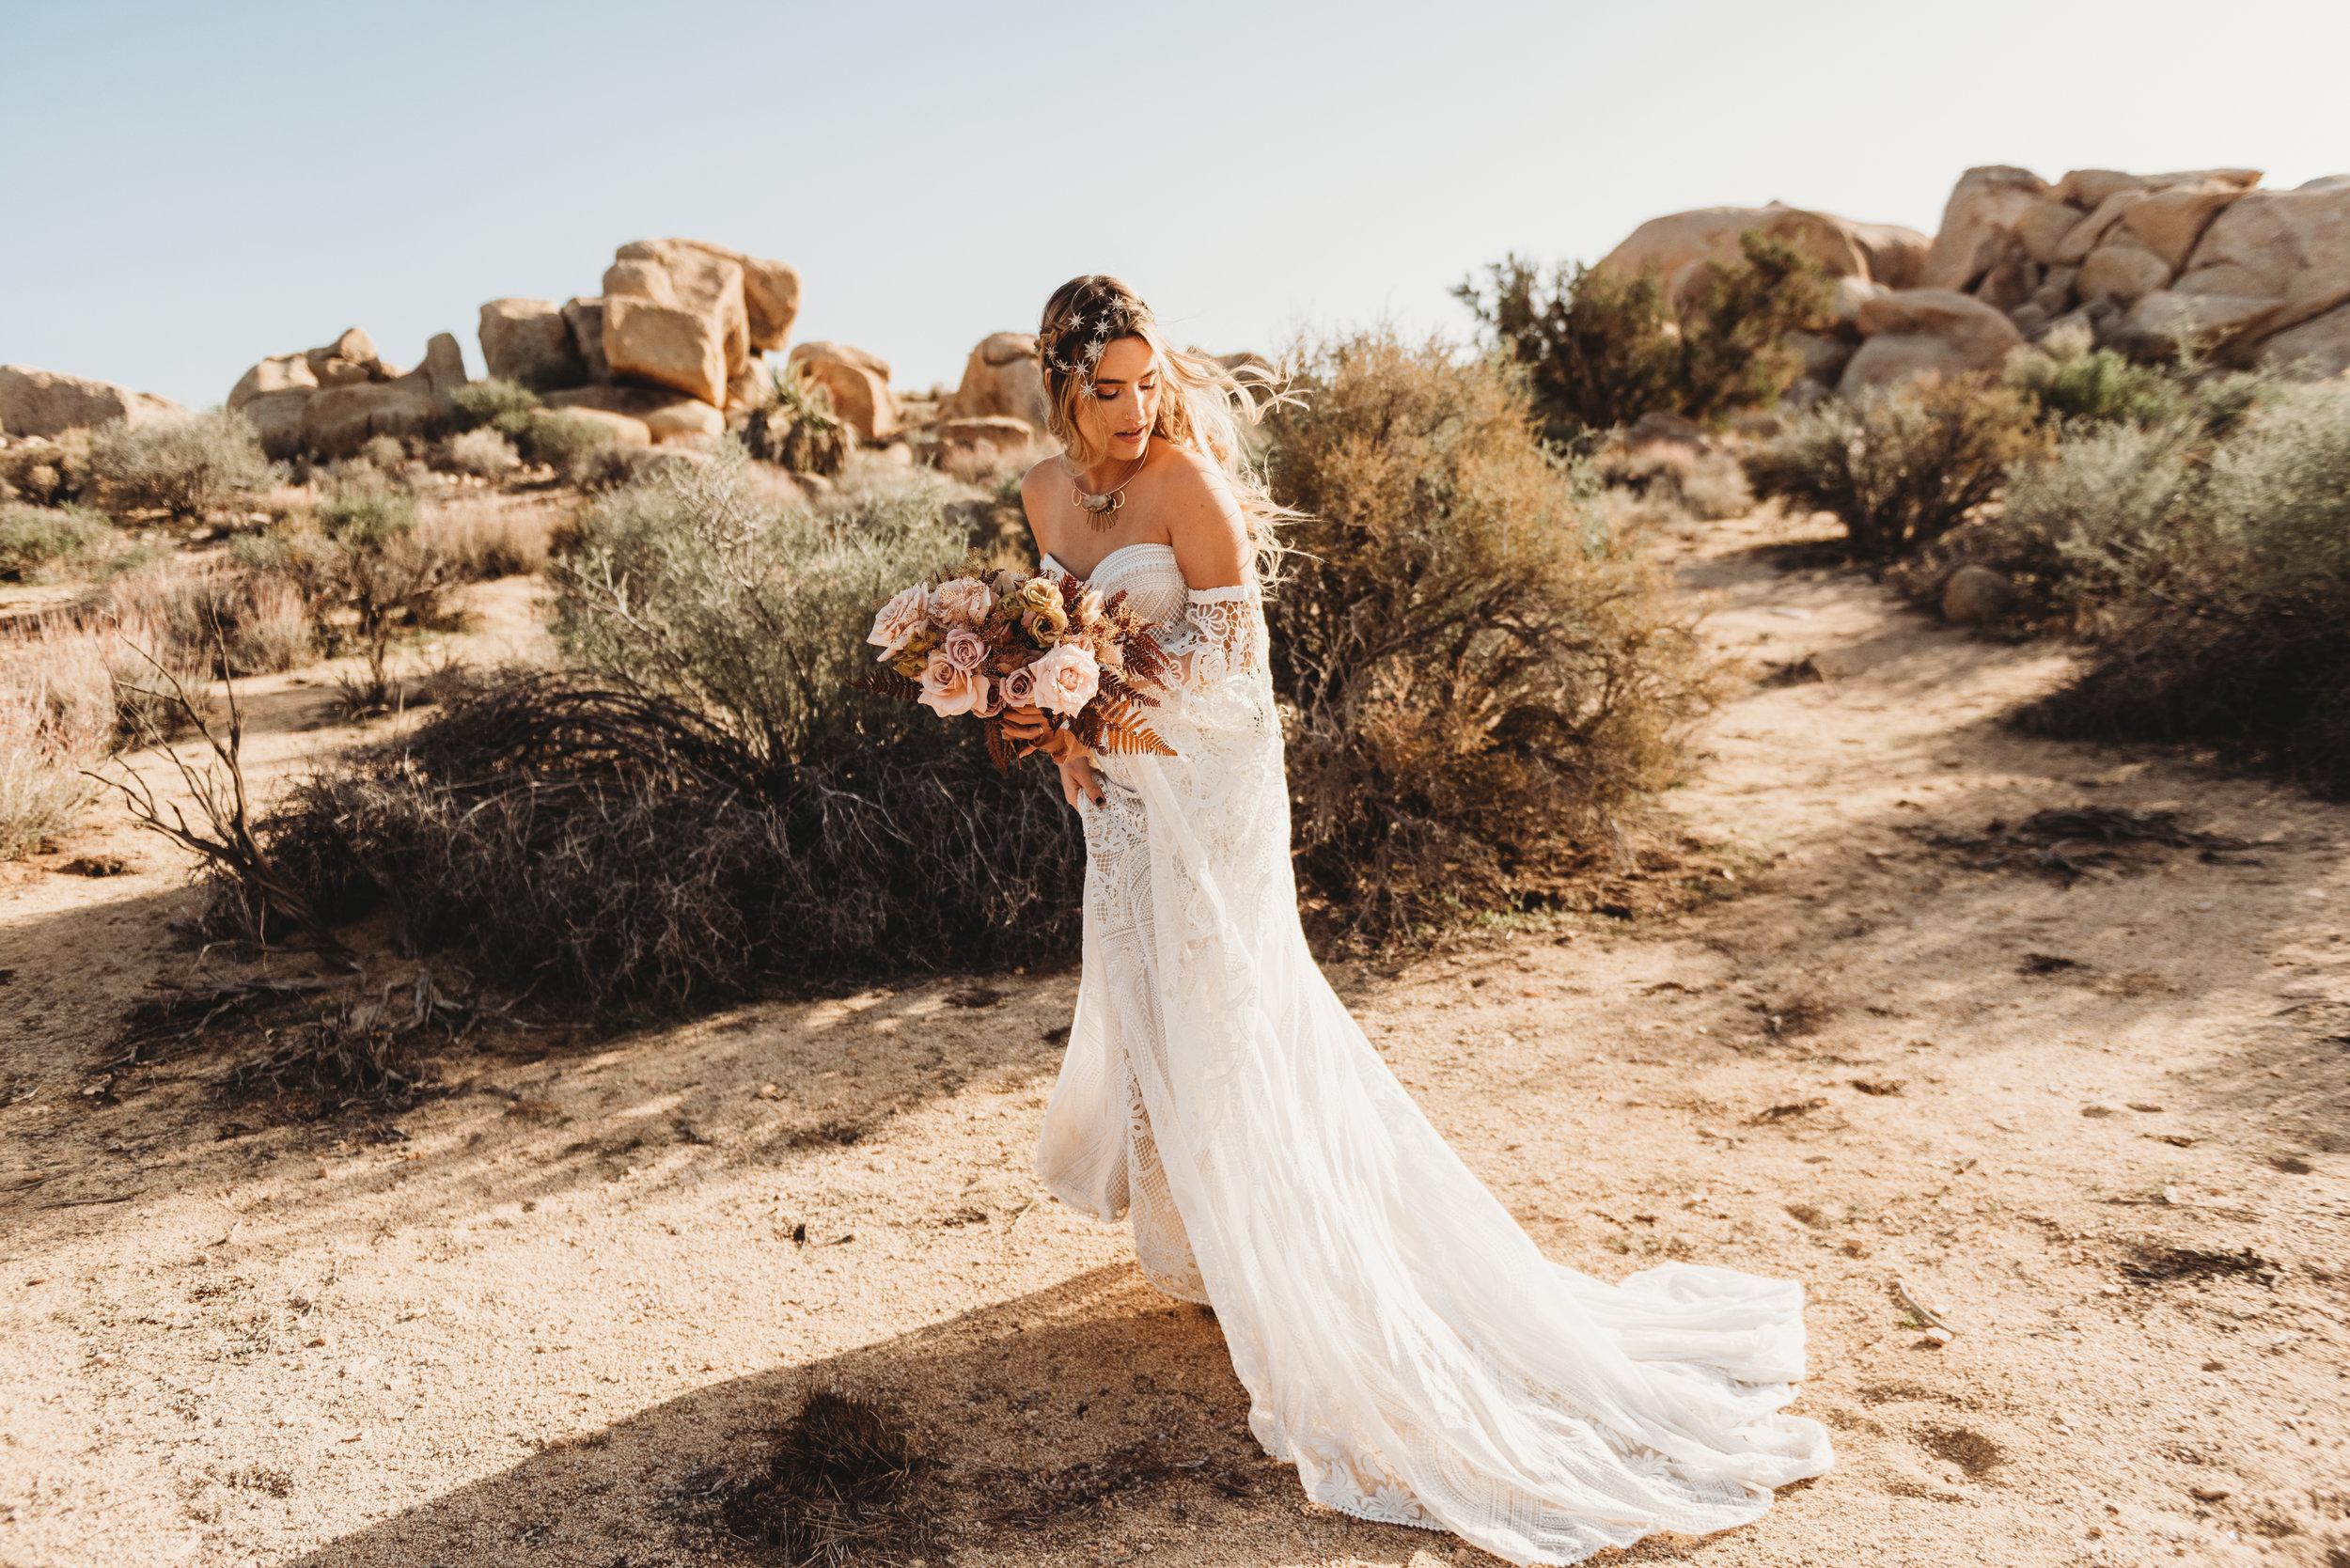 FortSt.John_photographer_TyraEPhotography_Wedding_Couple_Family_Photograhy_DawsonCreek_Elopement_Bride_Boduoir_Portraits-4865.jpg